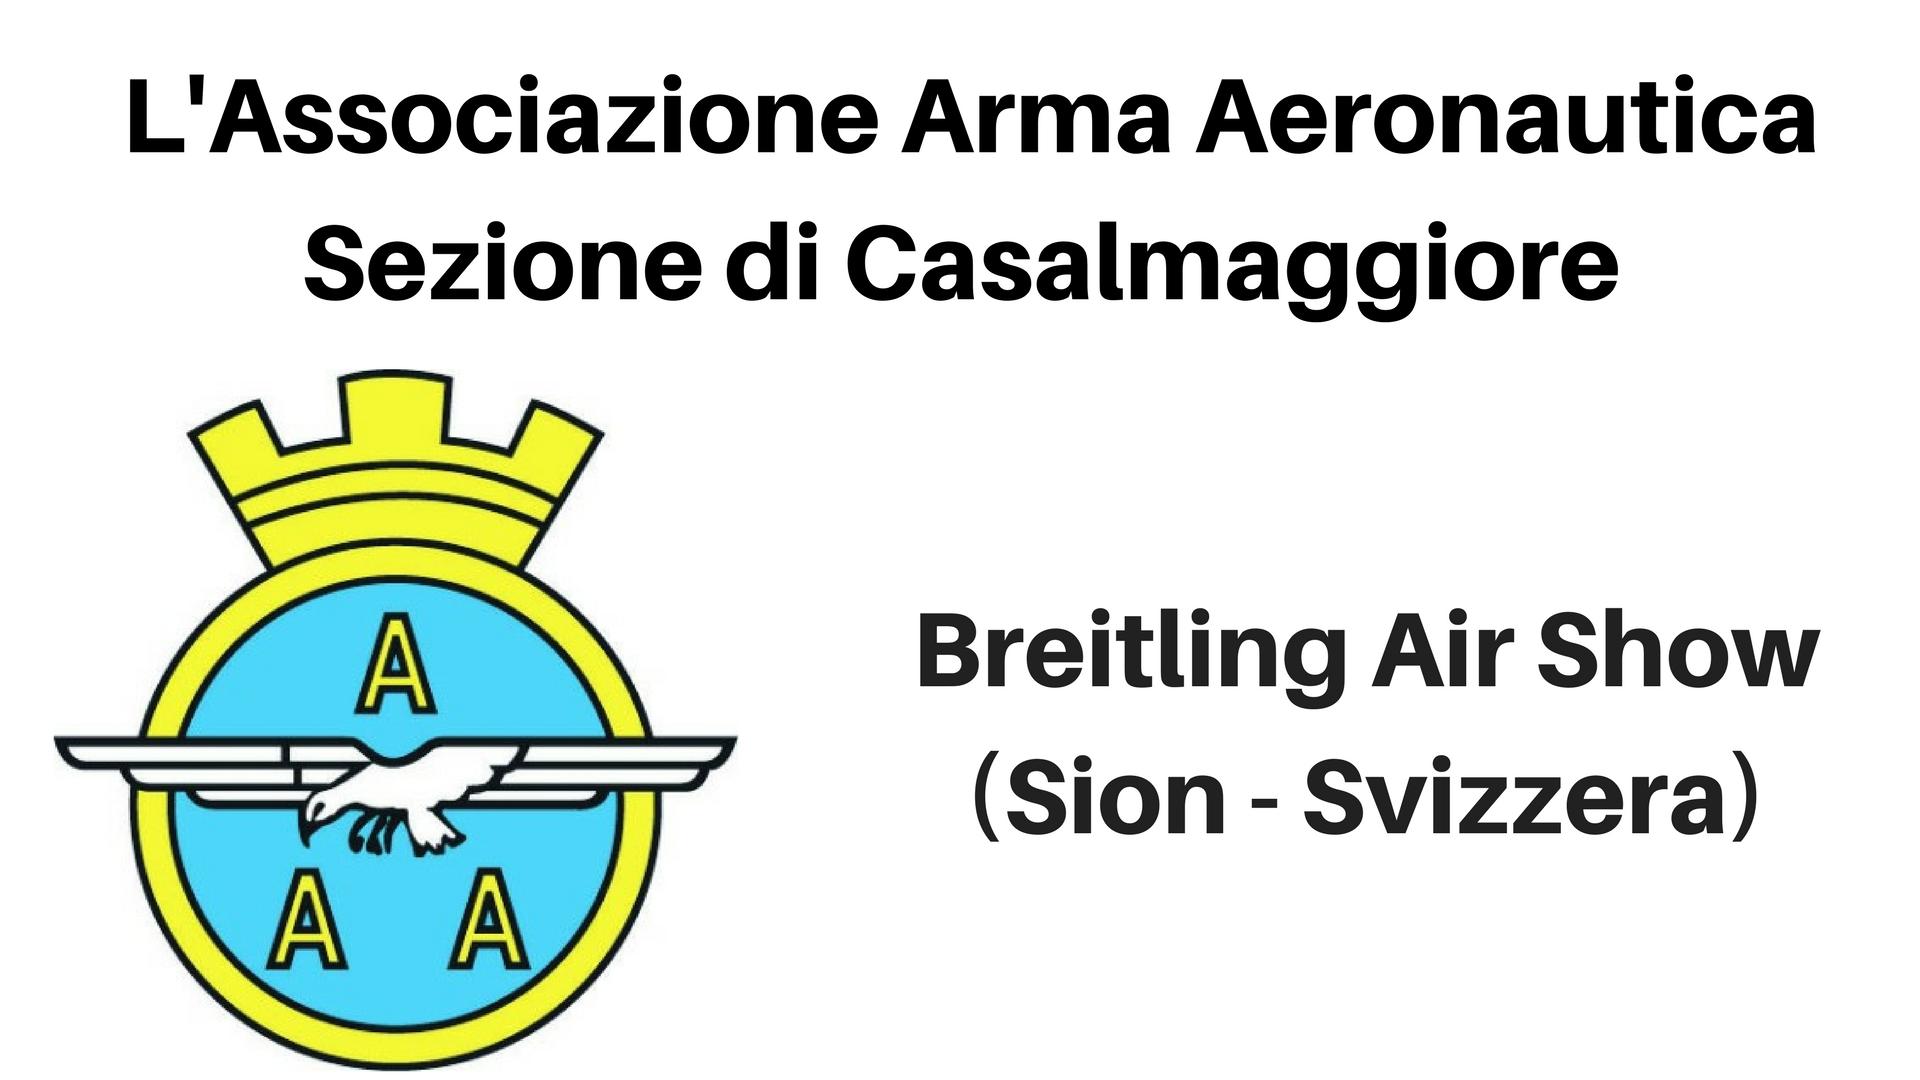 Breitling Air Show (Sion – Svizzera)